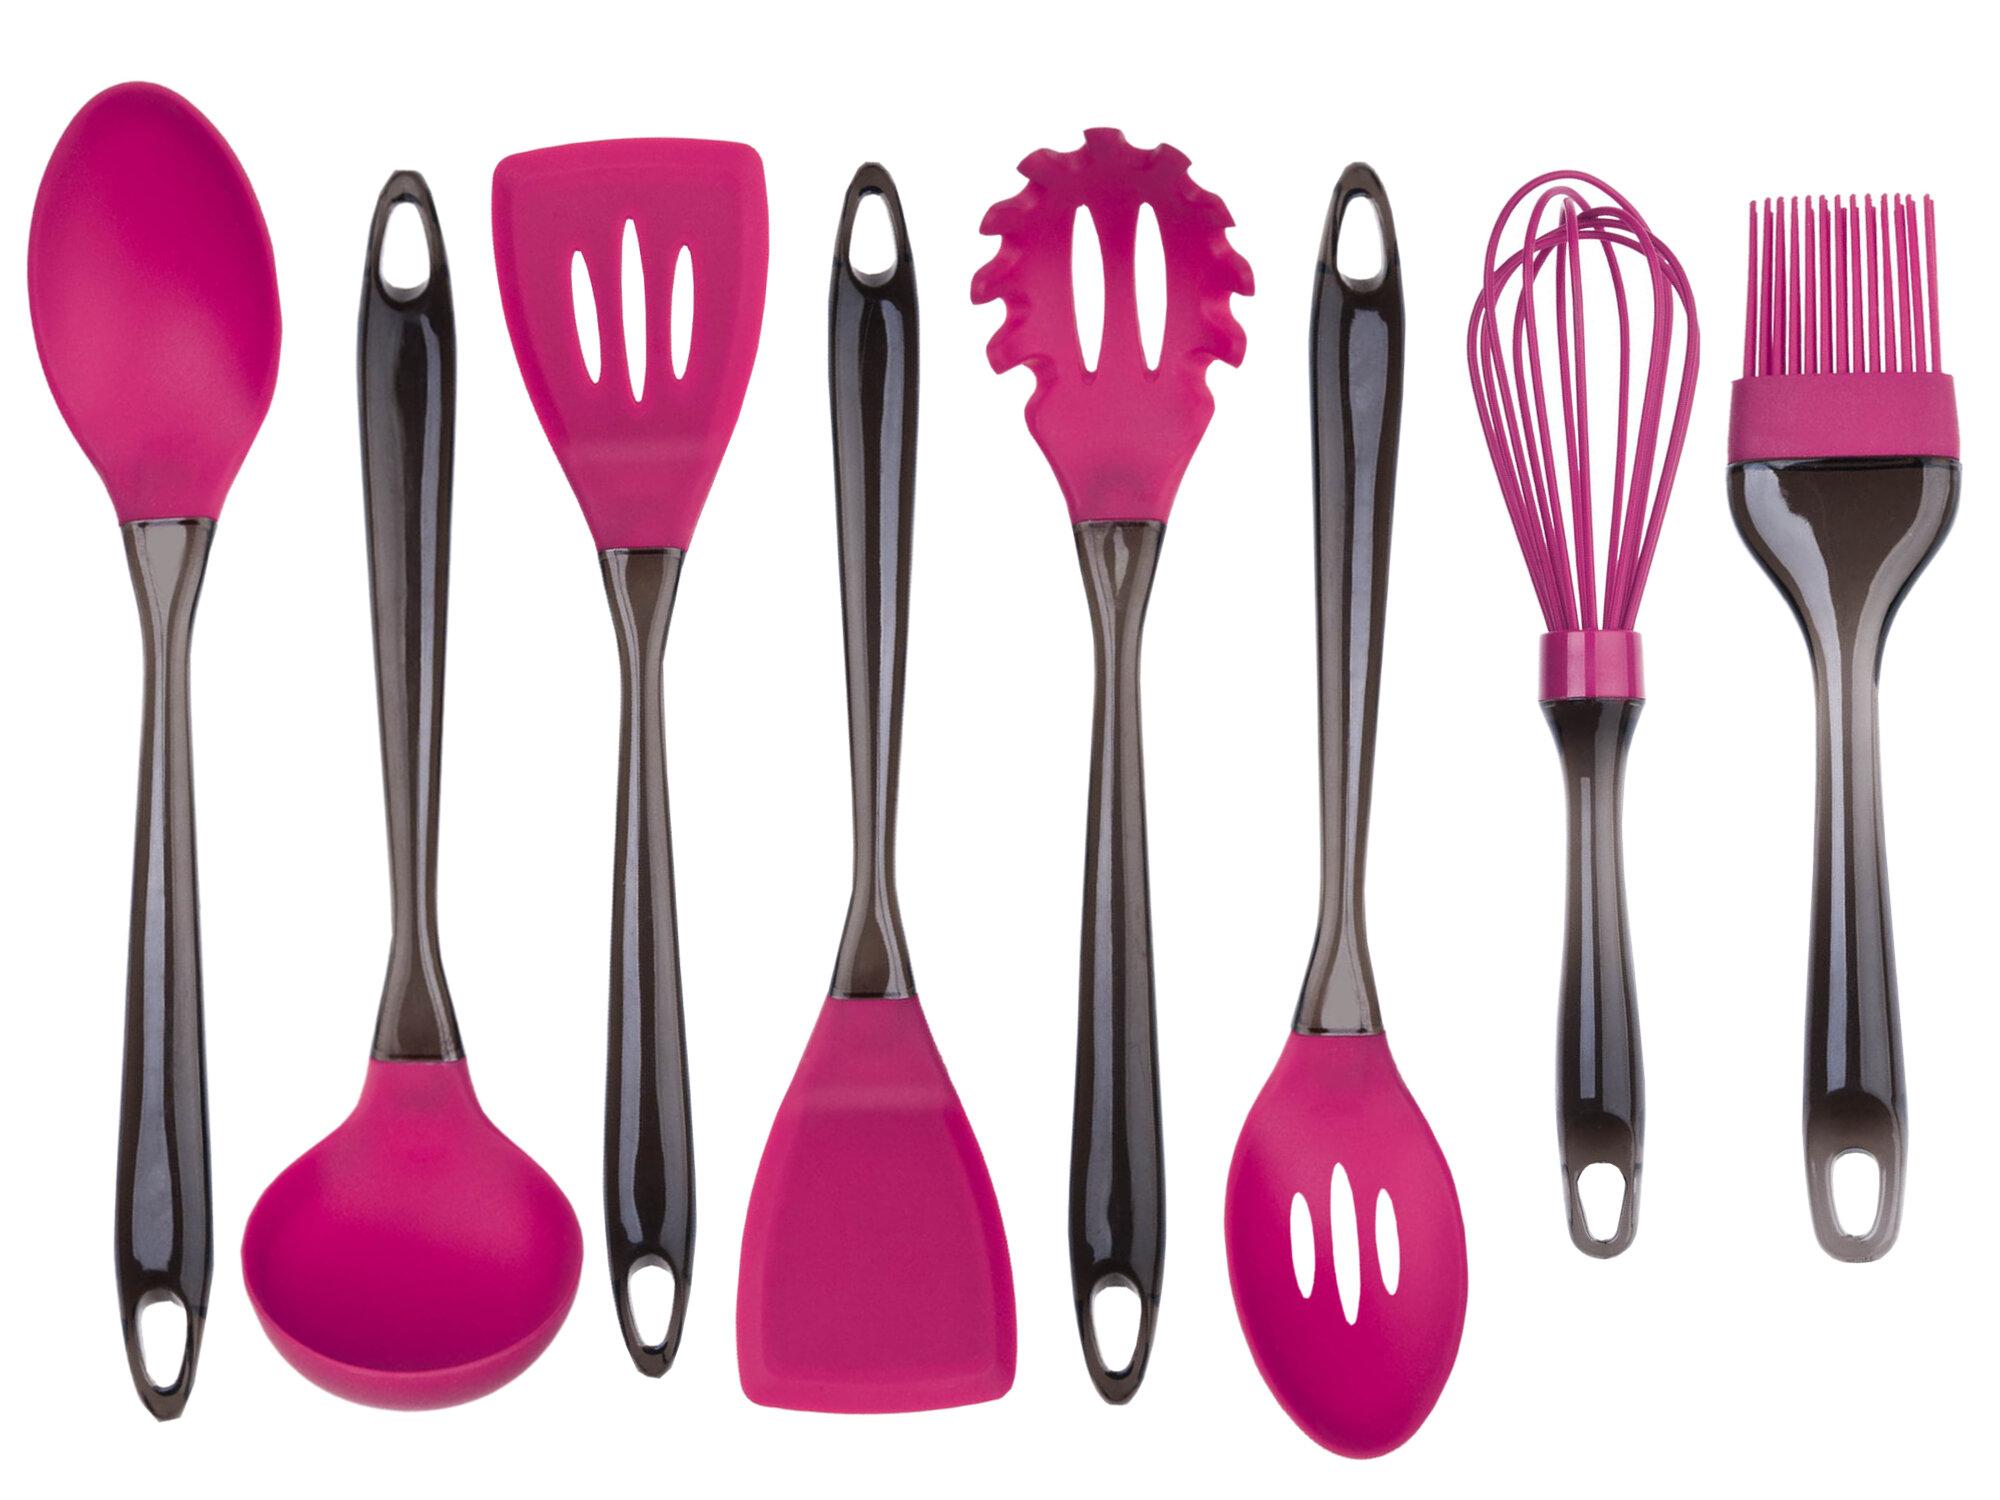 Culinary Edge 8 Piece Silicone Utensil Set & Reviews | Wayfair